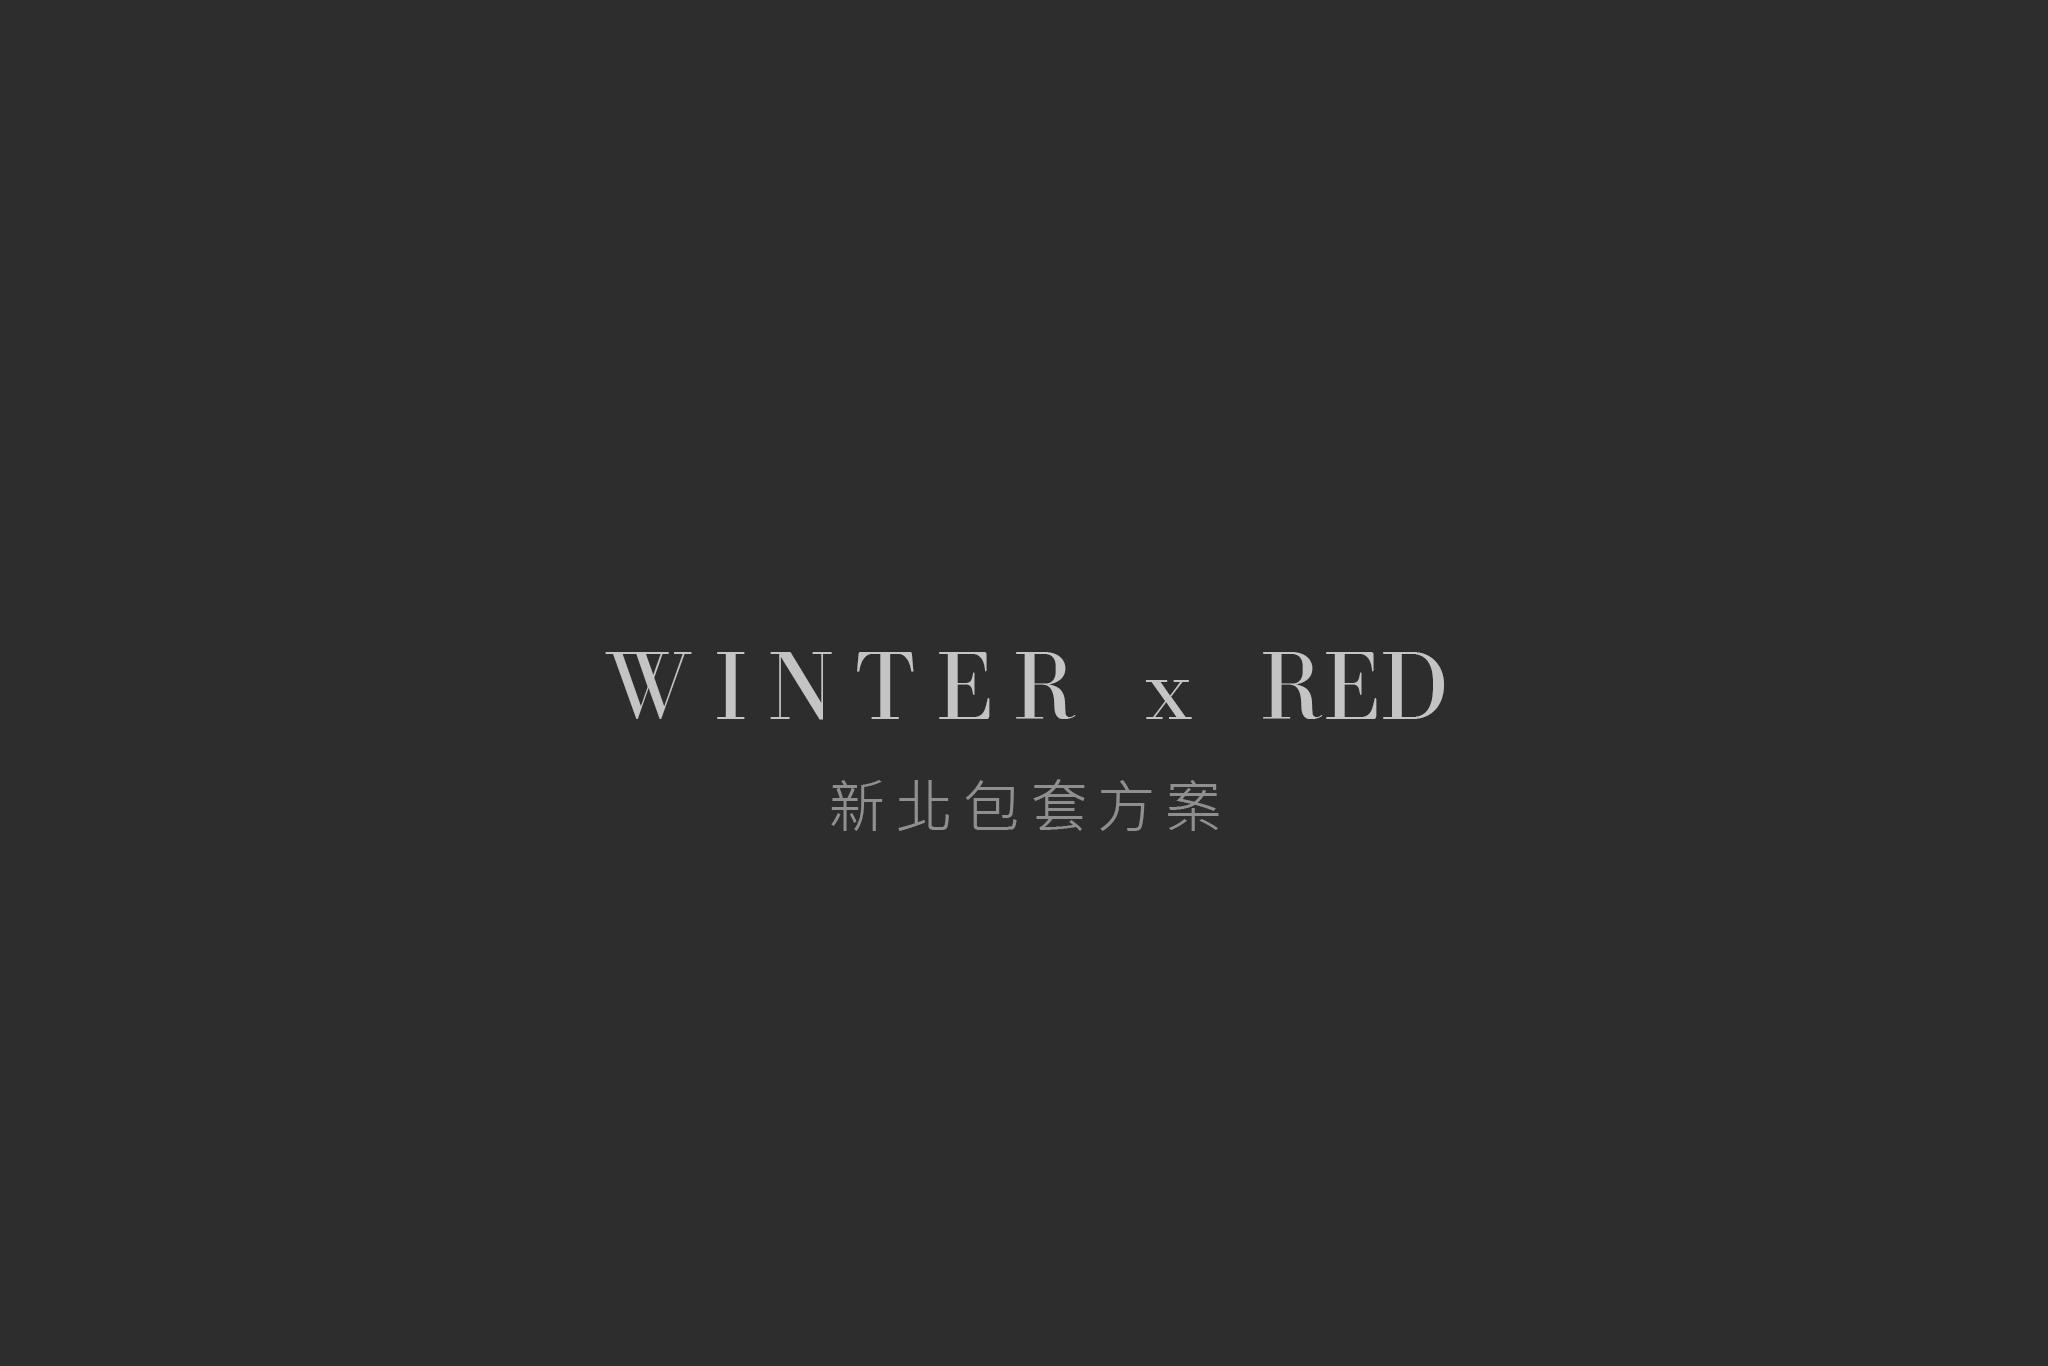 WINTER x RED